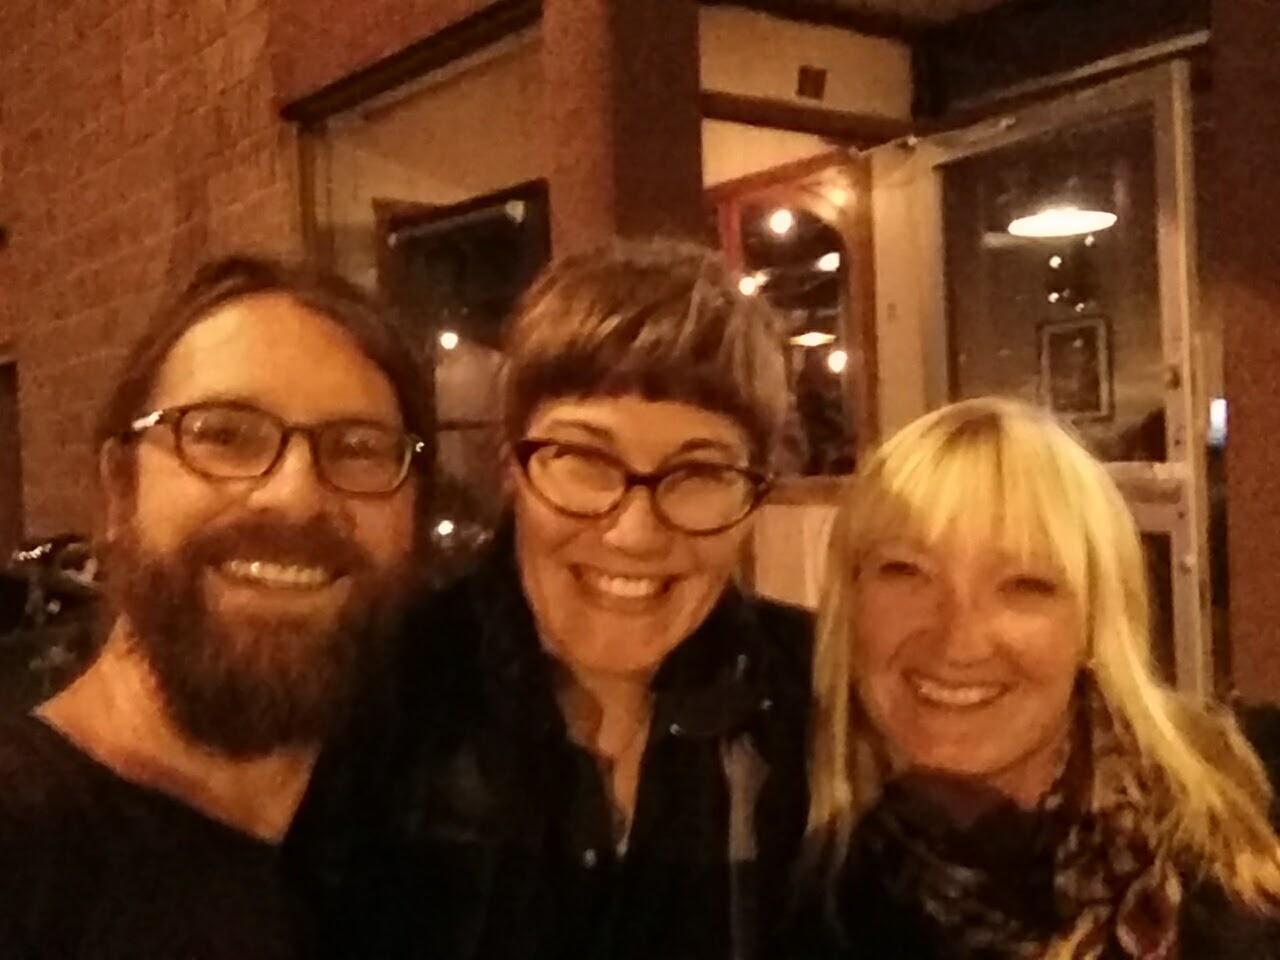 J, Renee and I enjoying some delightful libations at Dieu du Ciel